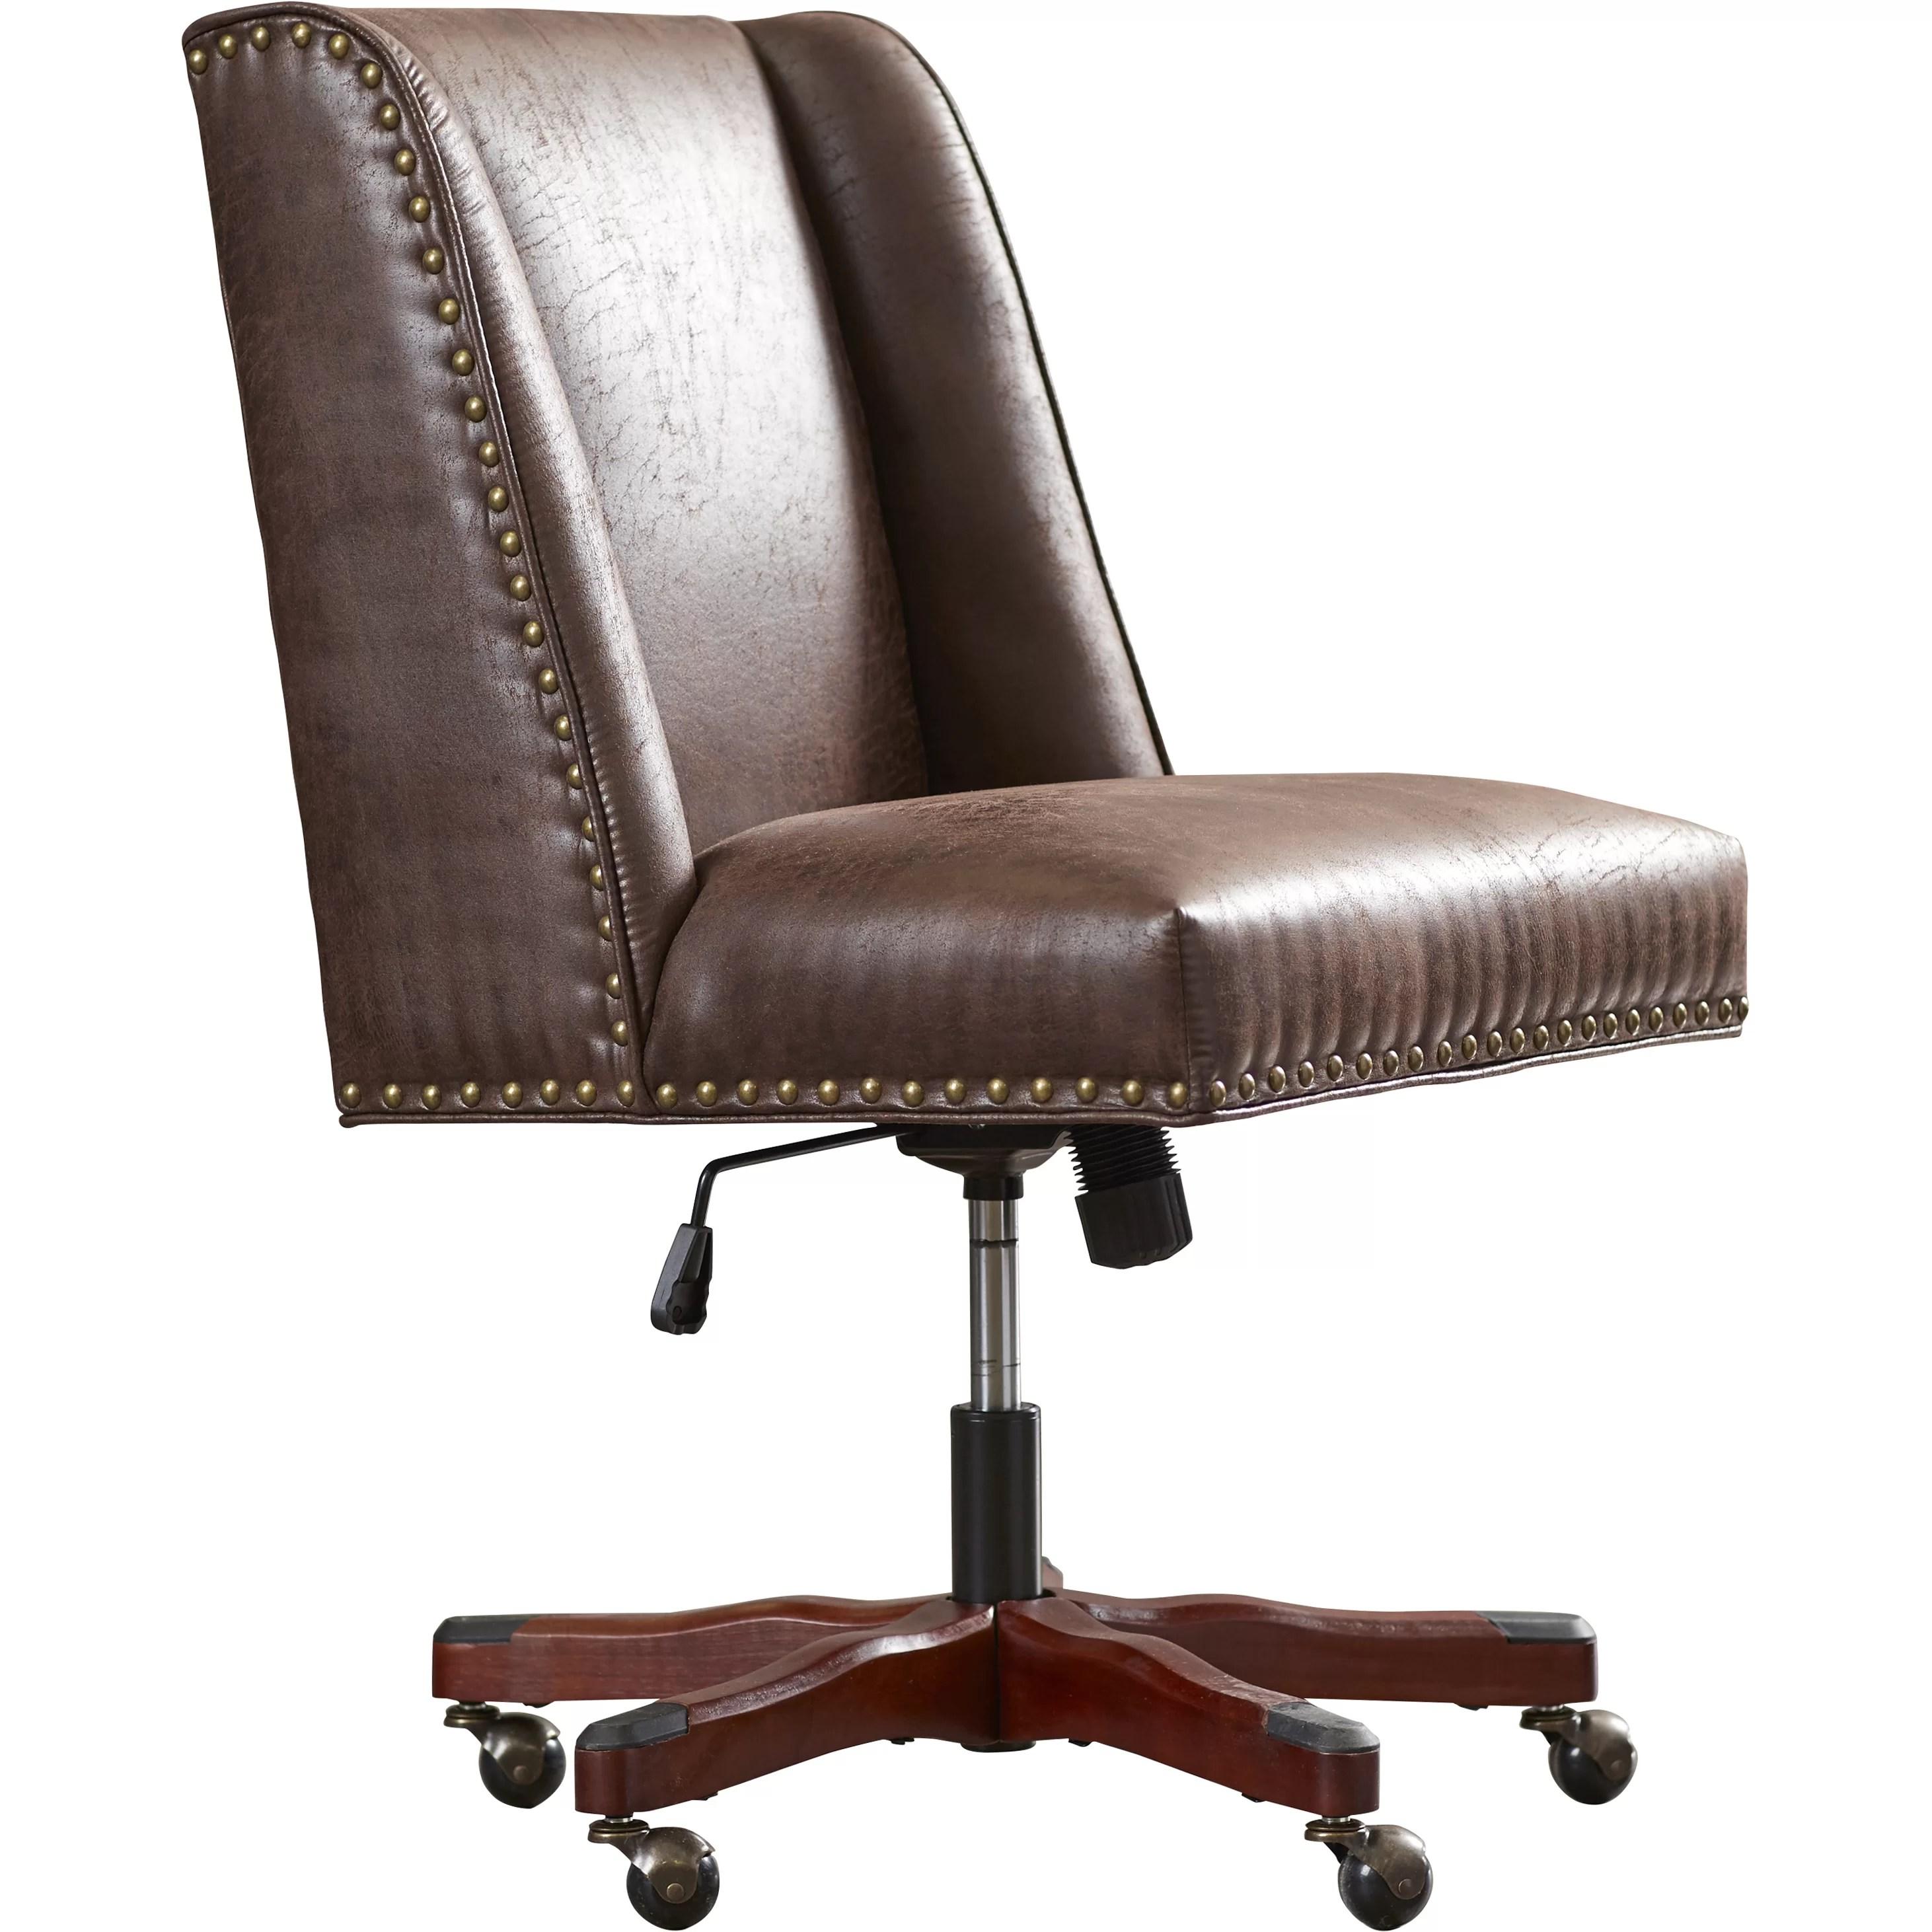 desk chair reviews resin adirondack chairs canadian tire three posts brennan and wayfair